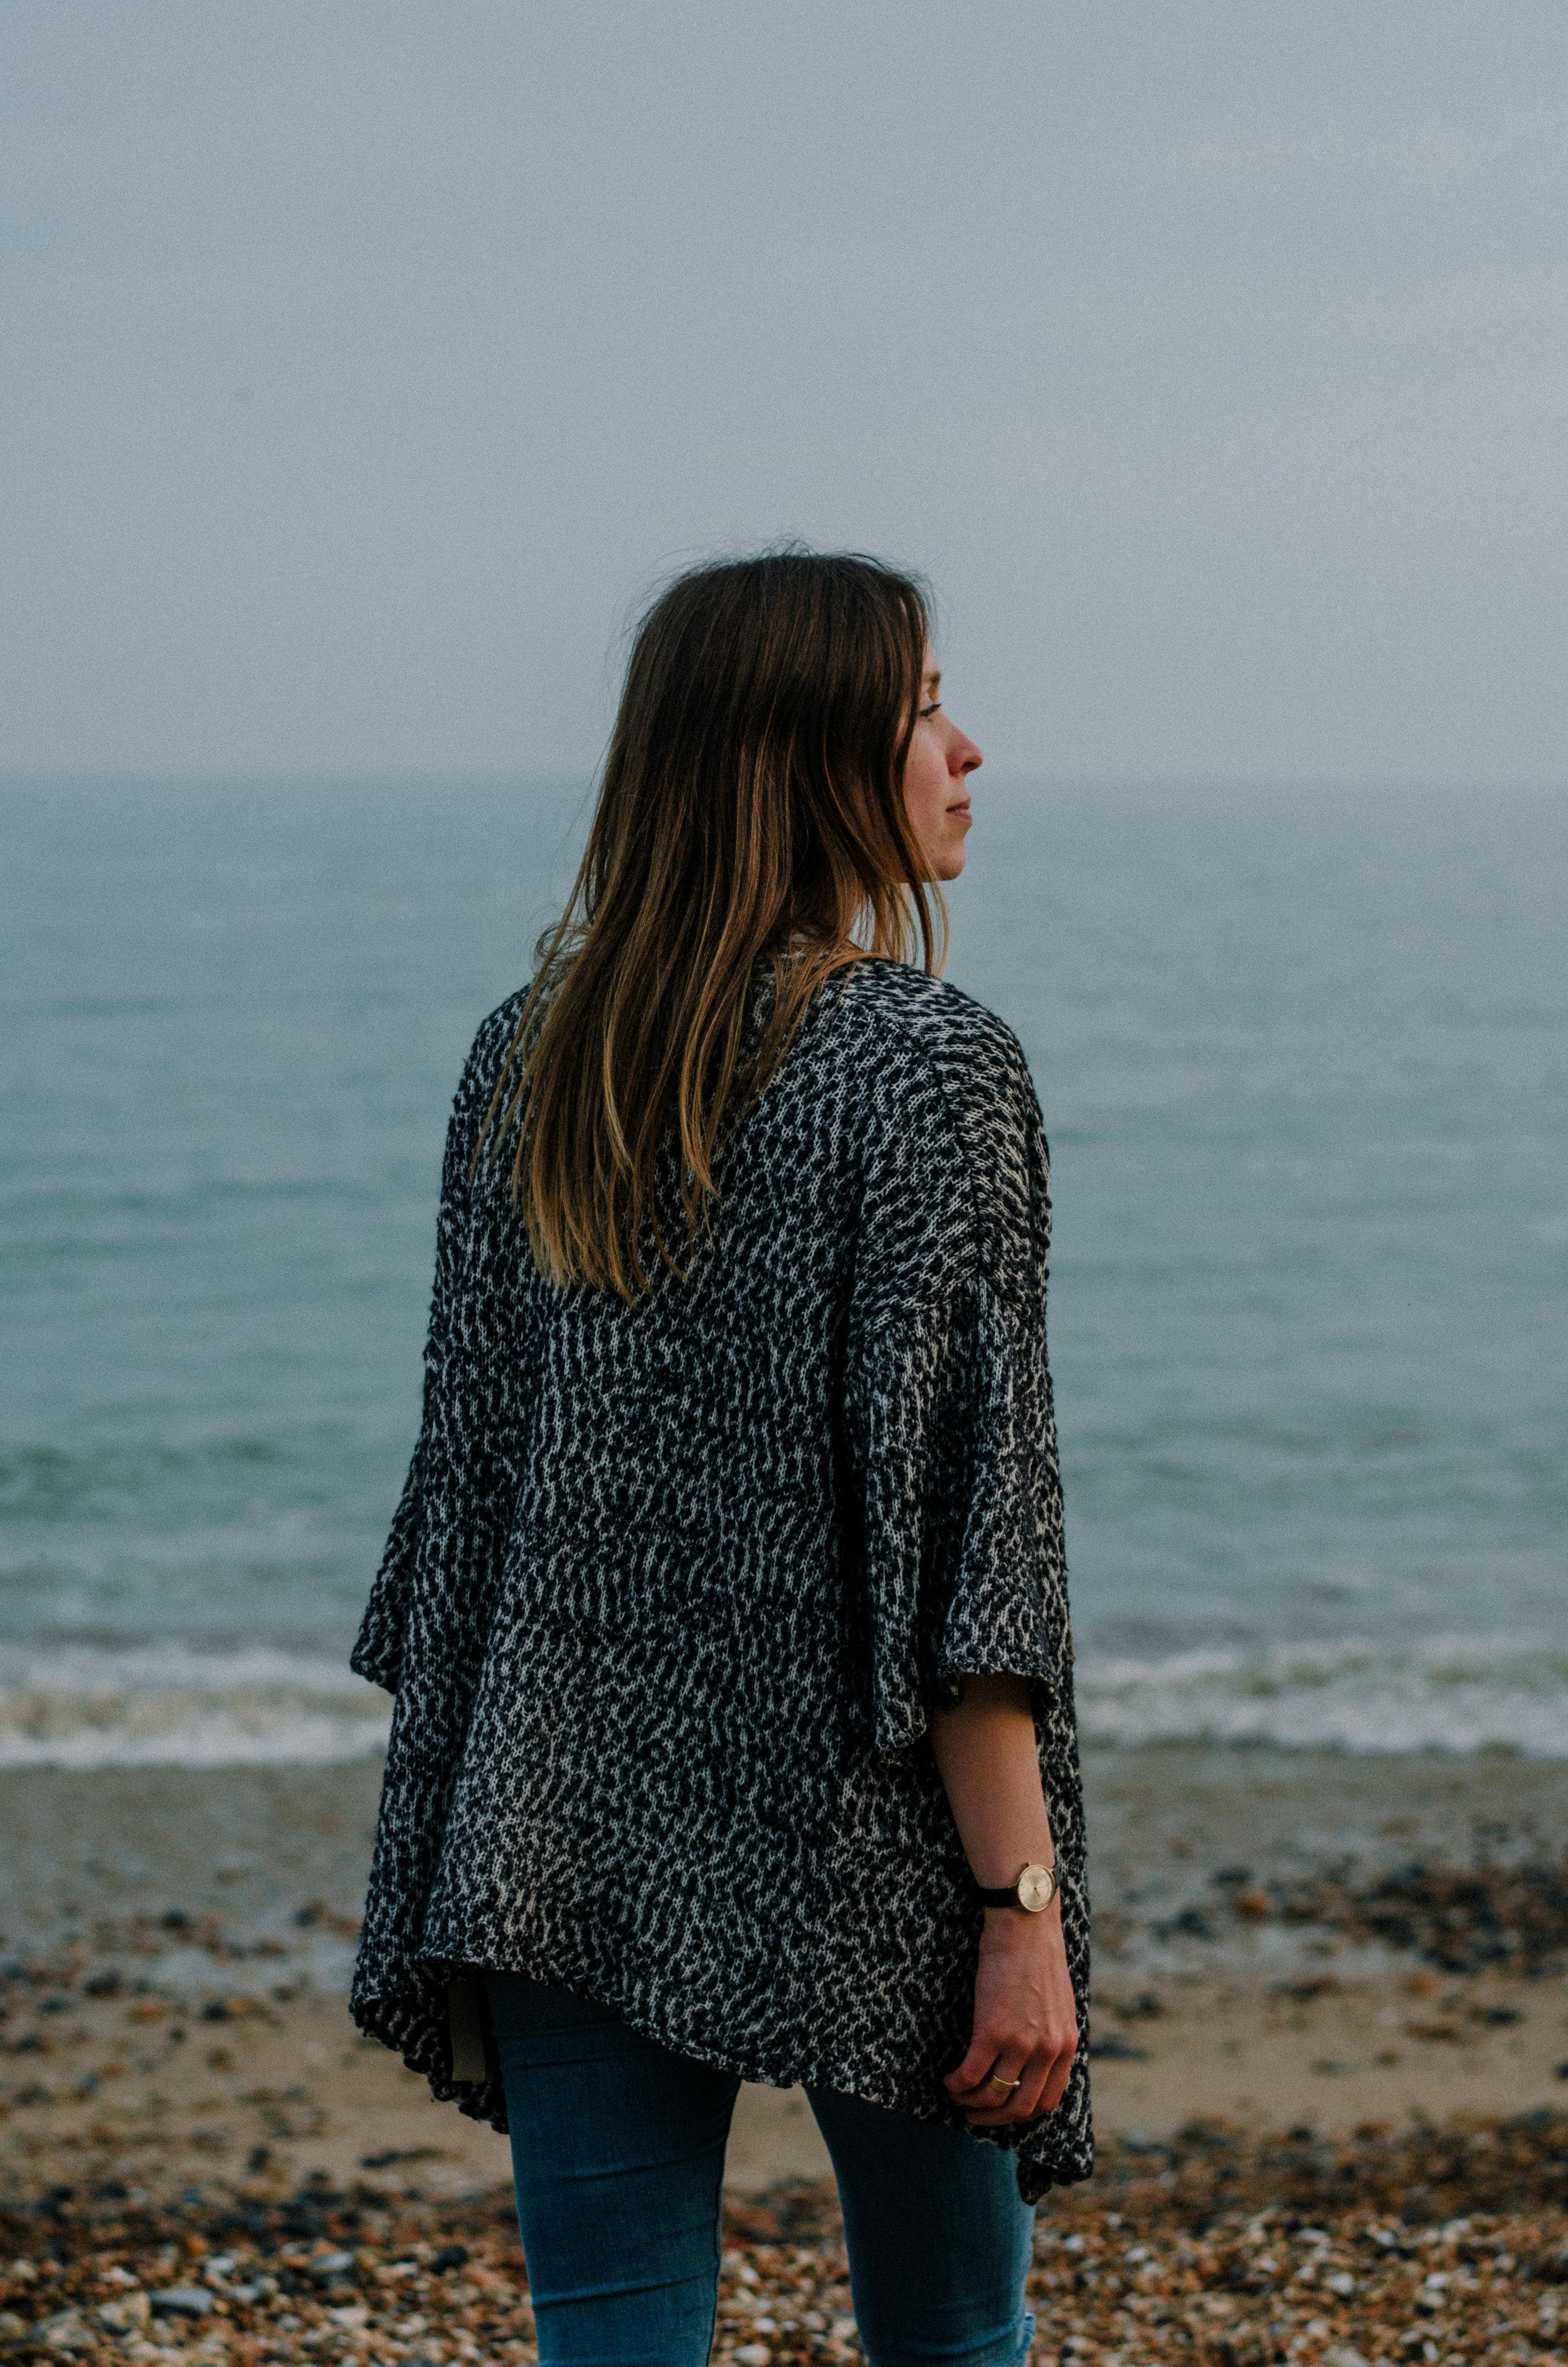 Lina - Portraits in Brighton - Aiste Saulyte Photography-59.jpg